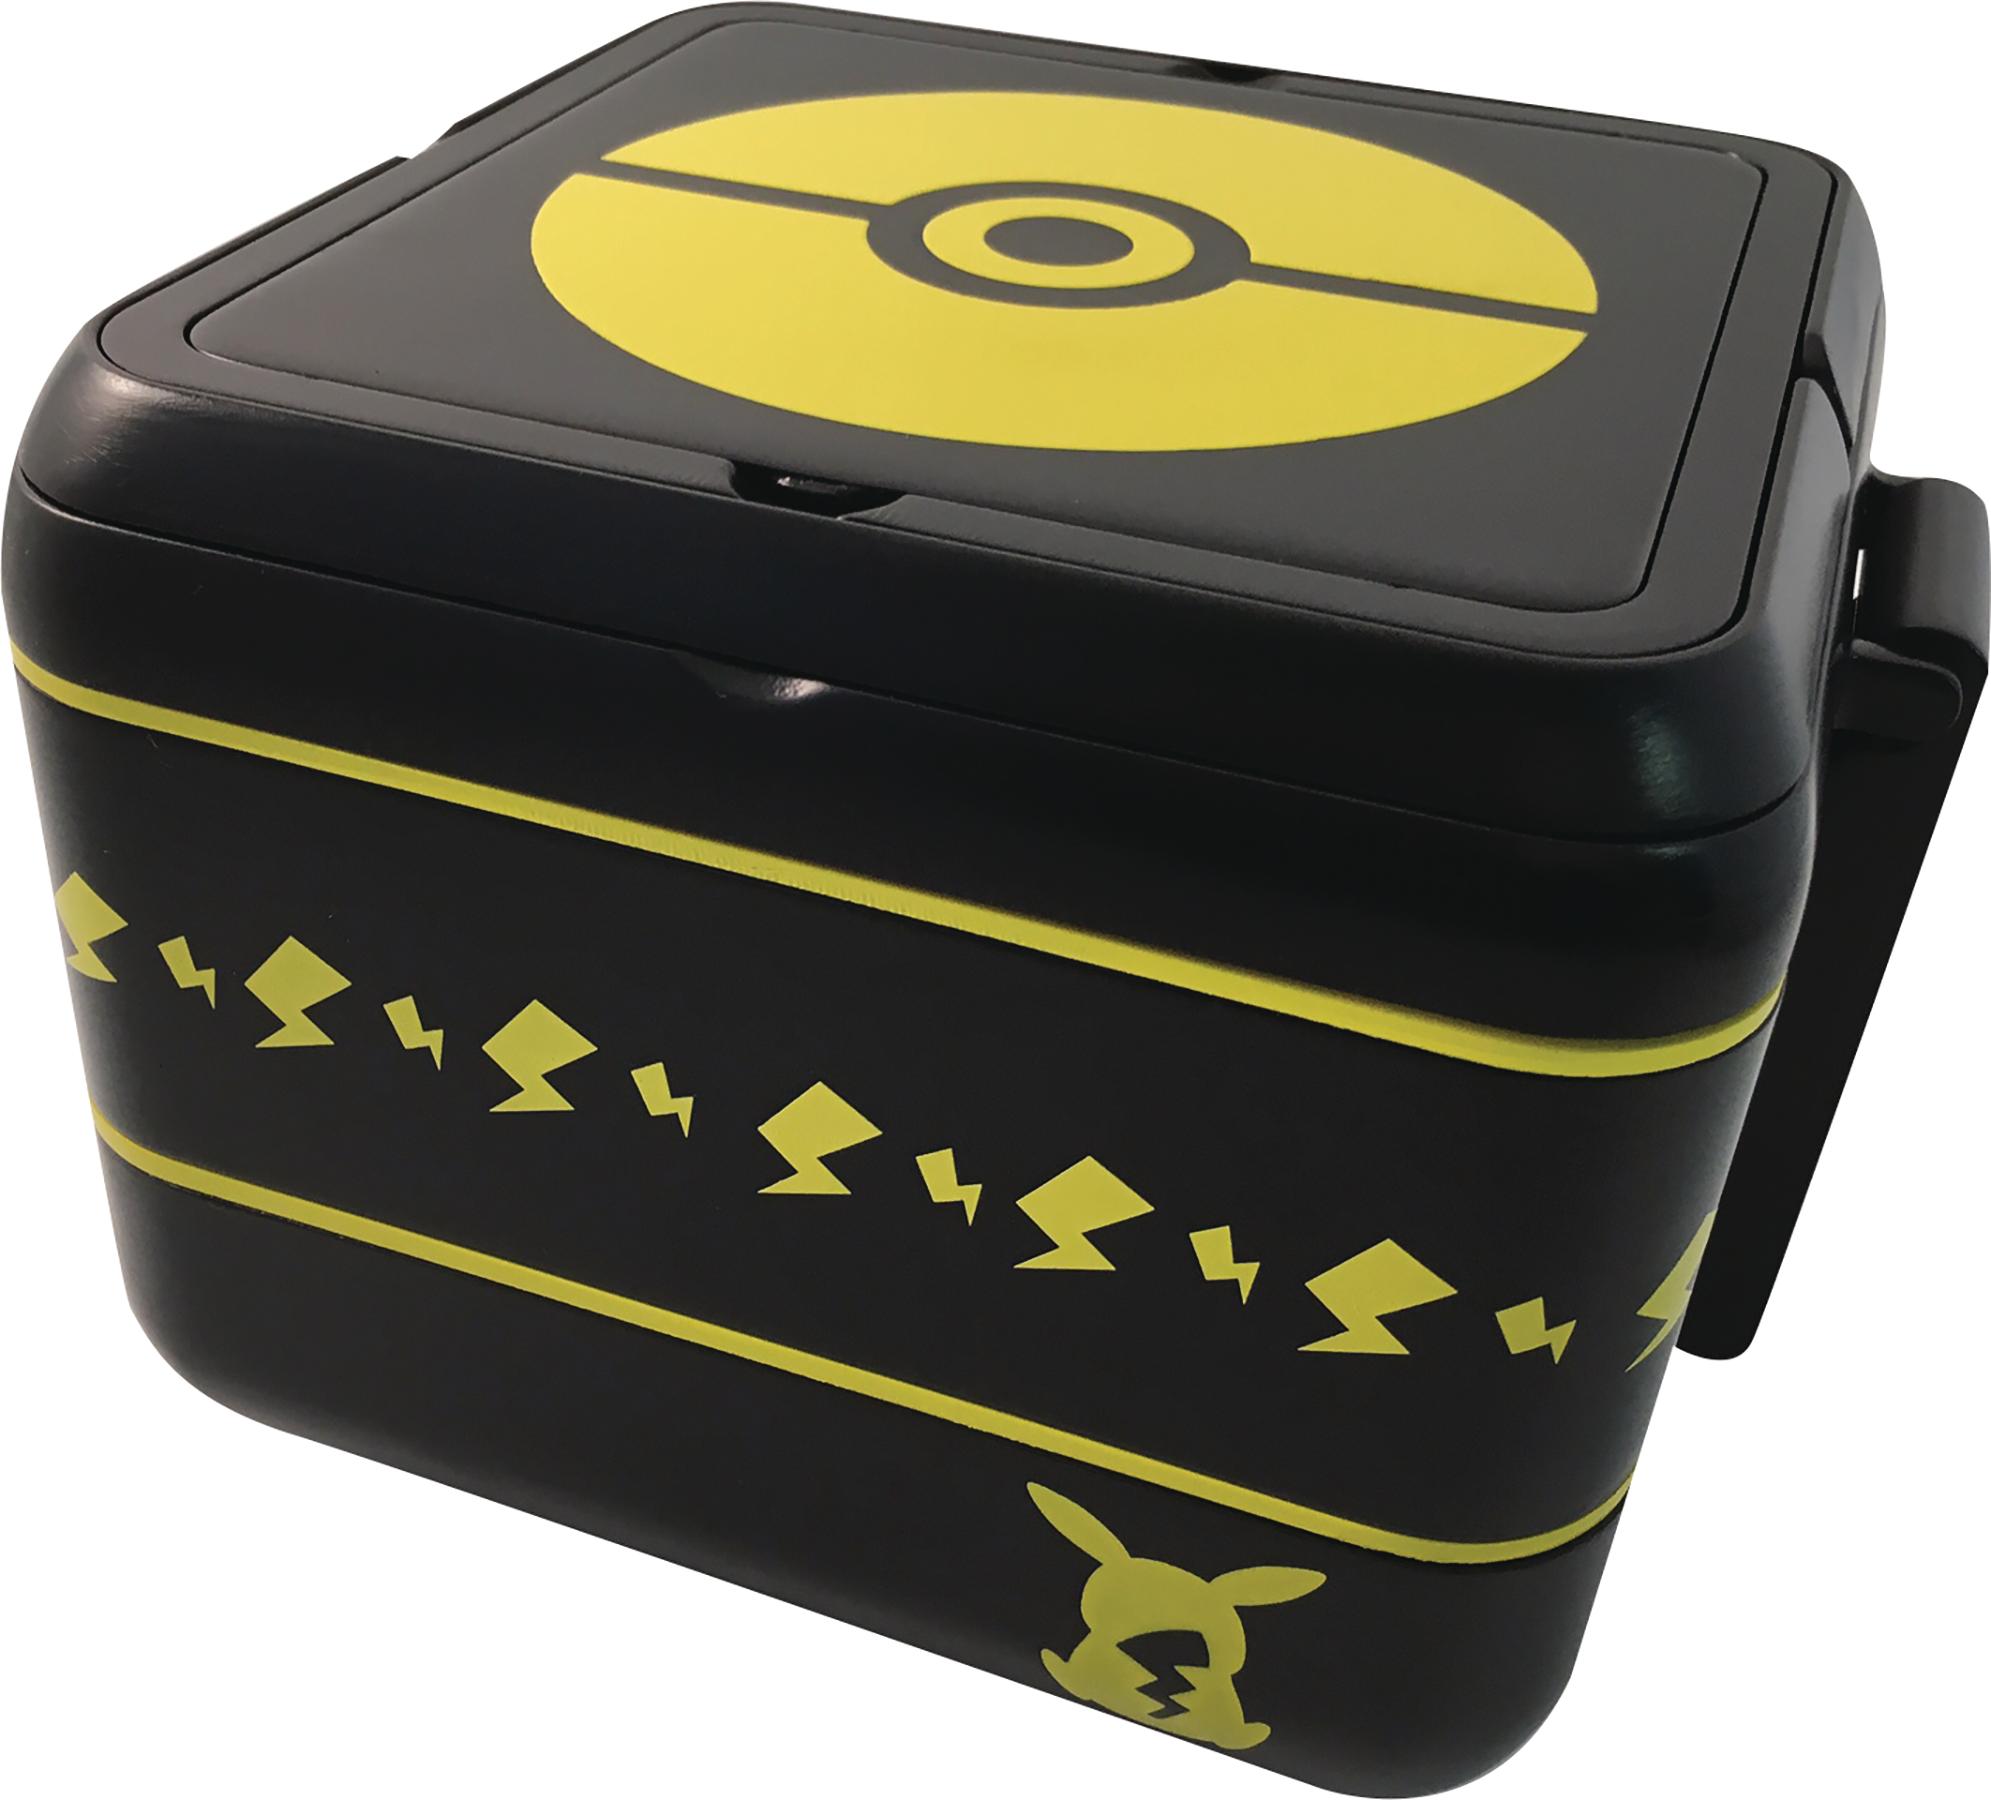 jul168568 pokemon pikachu bento box previews world. Black Bedroom Furniture Sets. Home Design Ideas